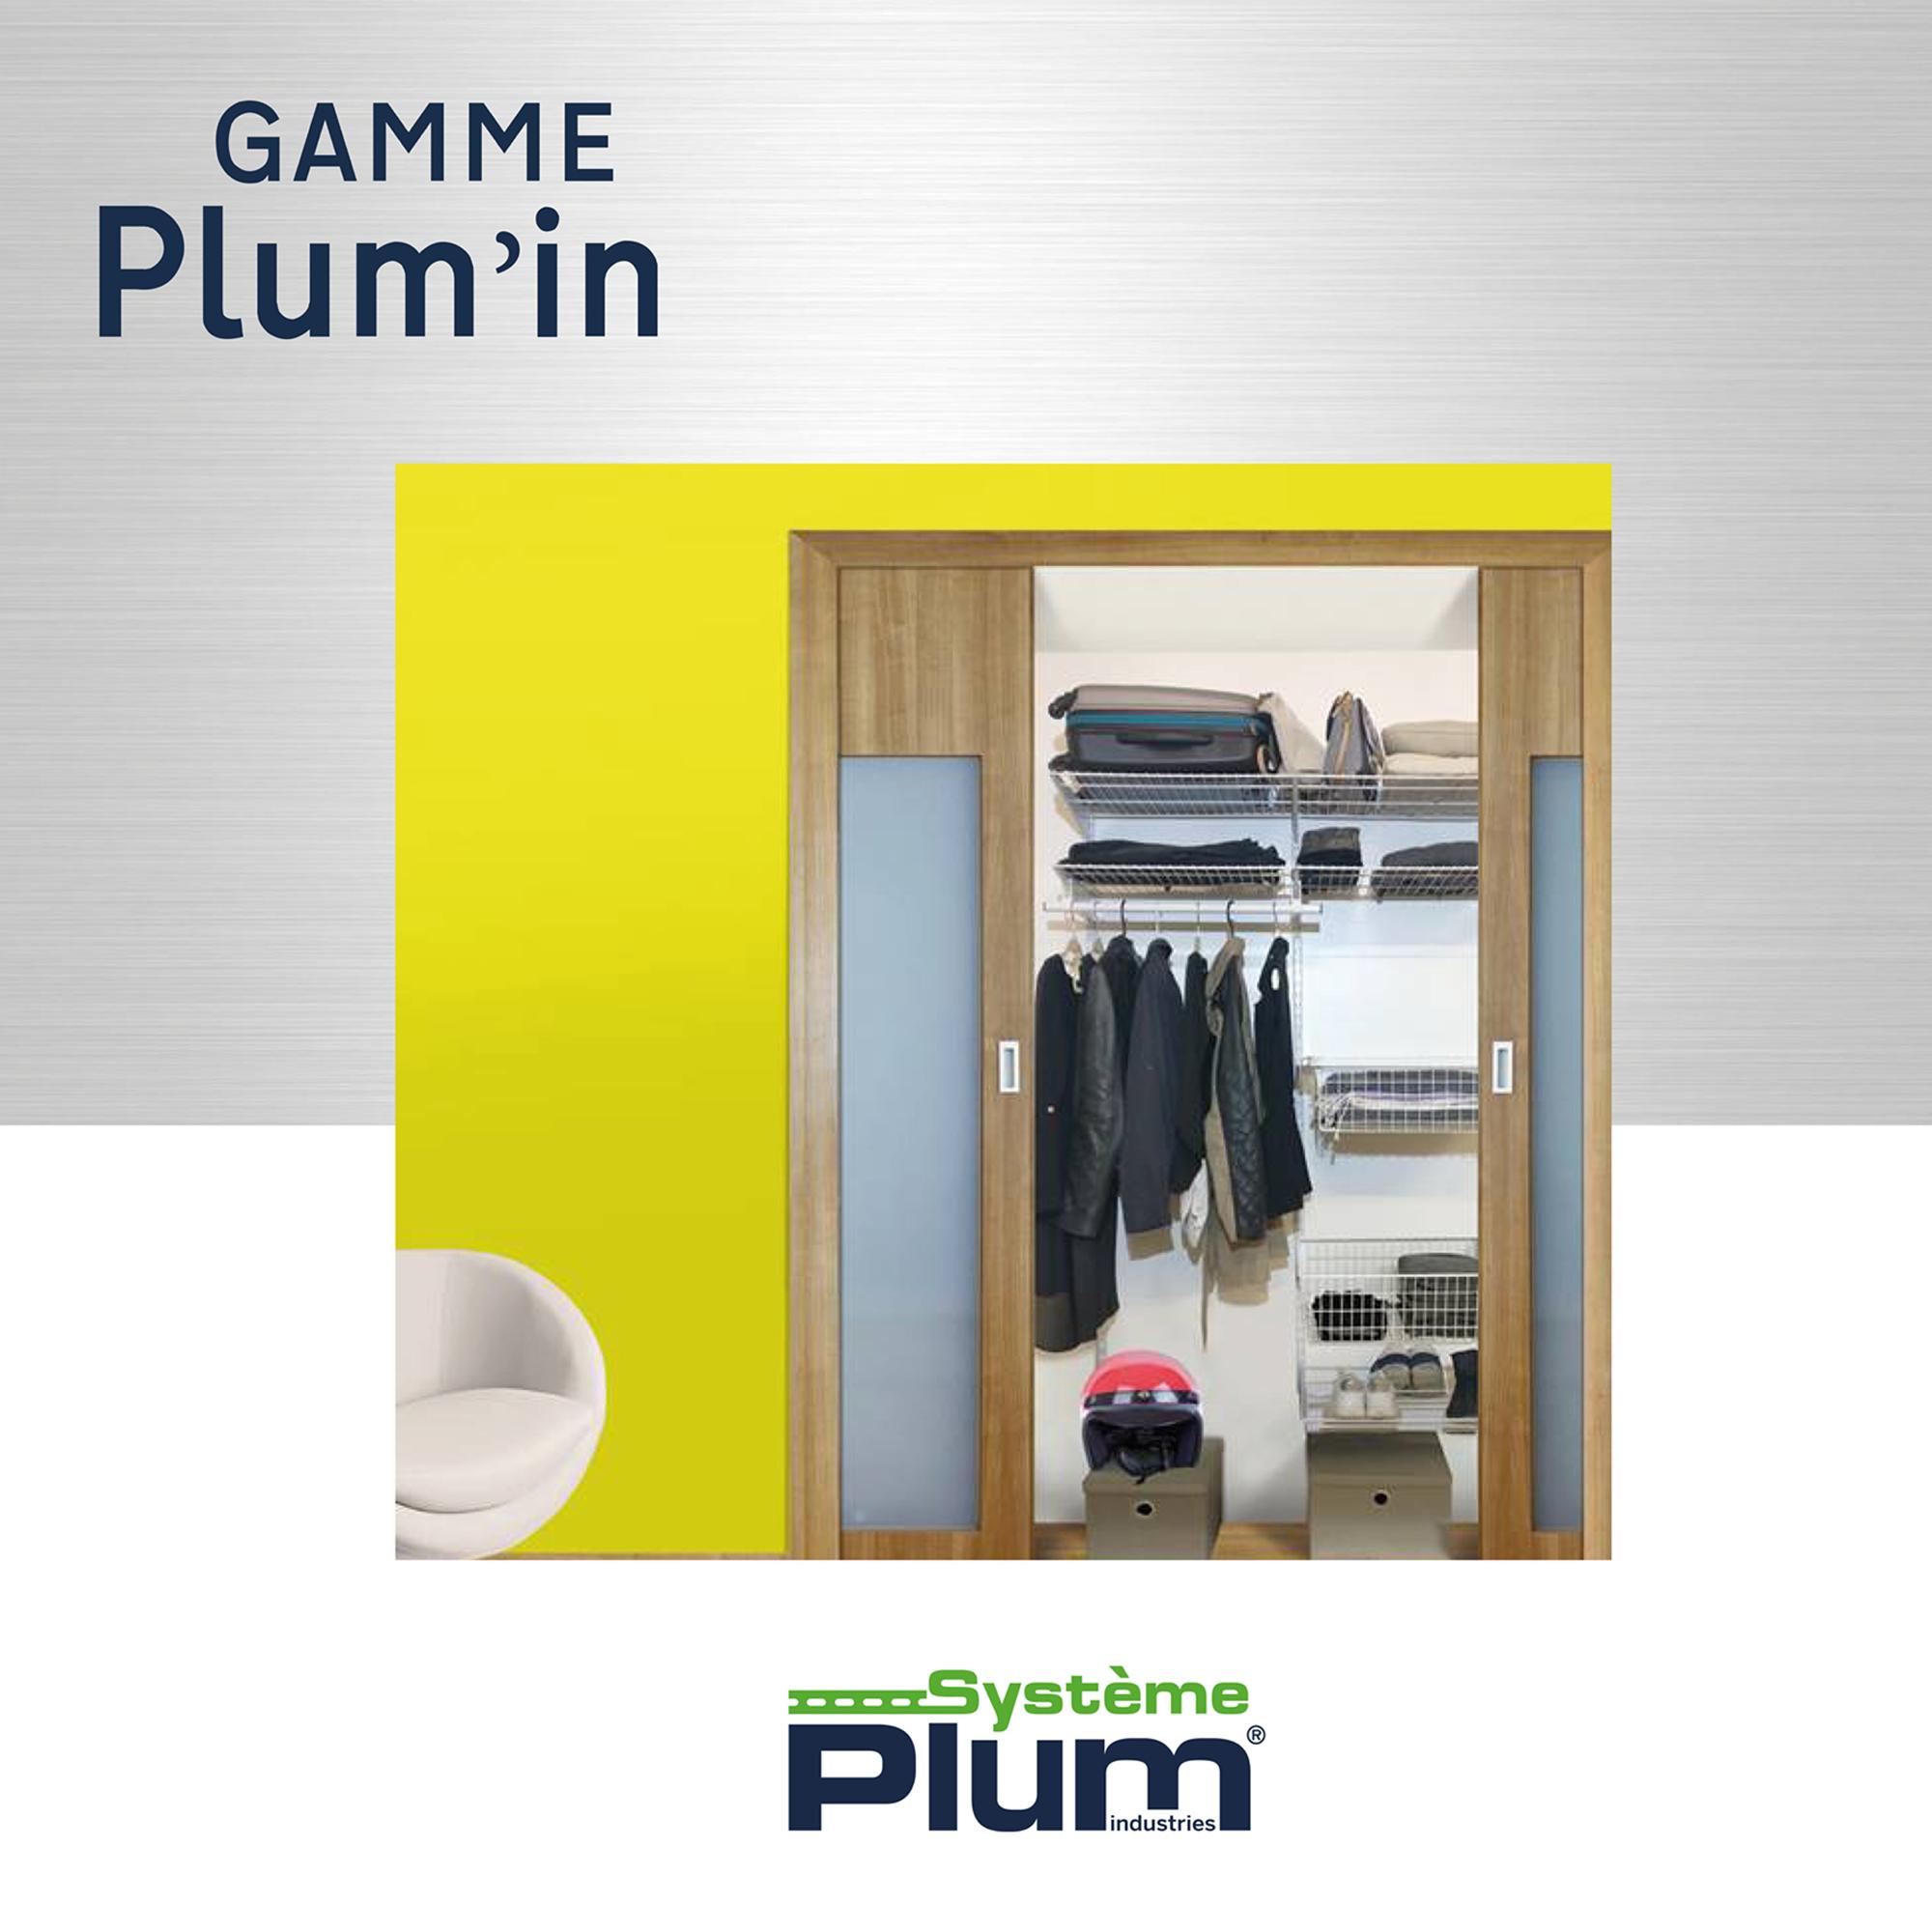 systeme plum industries le fabricant qui optimise vos rangement. Black Bedroom Furniture Sets. Home Design Ideas